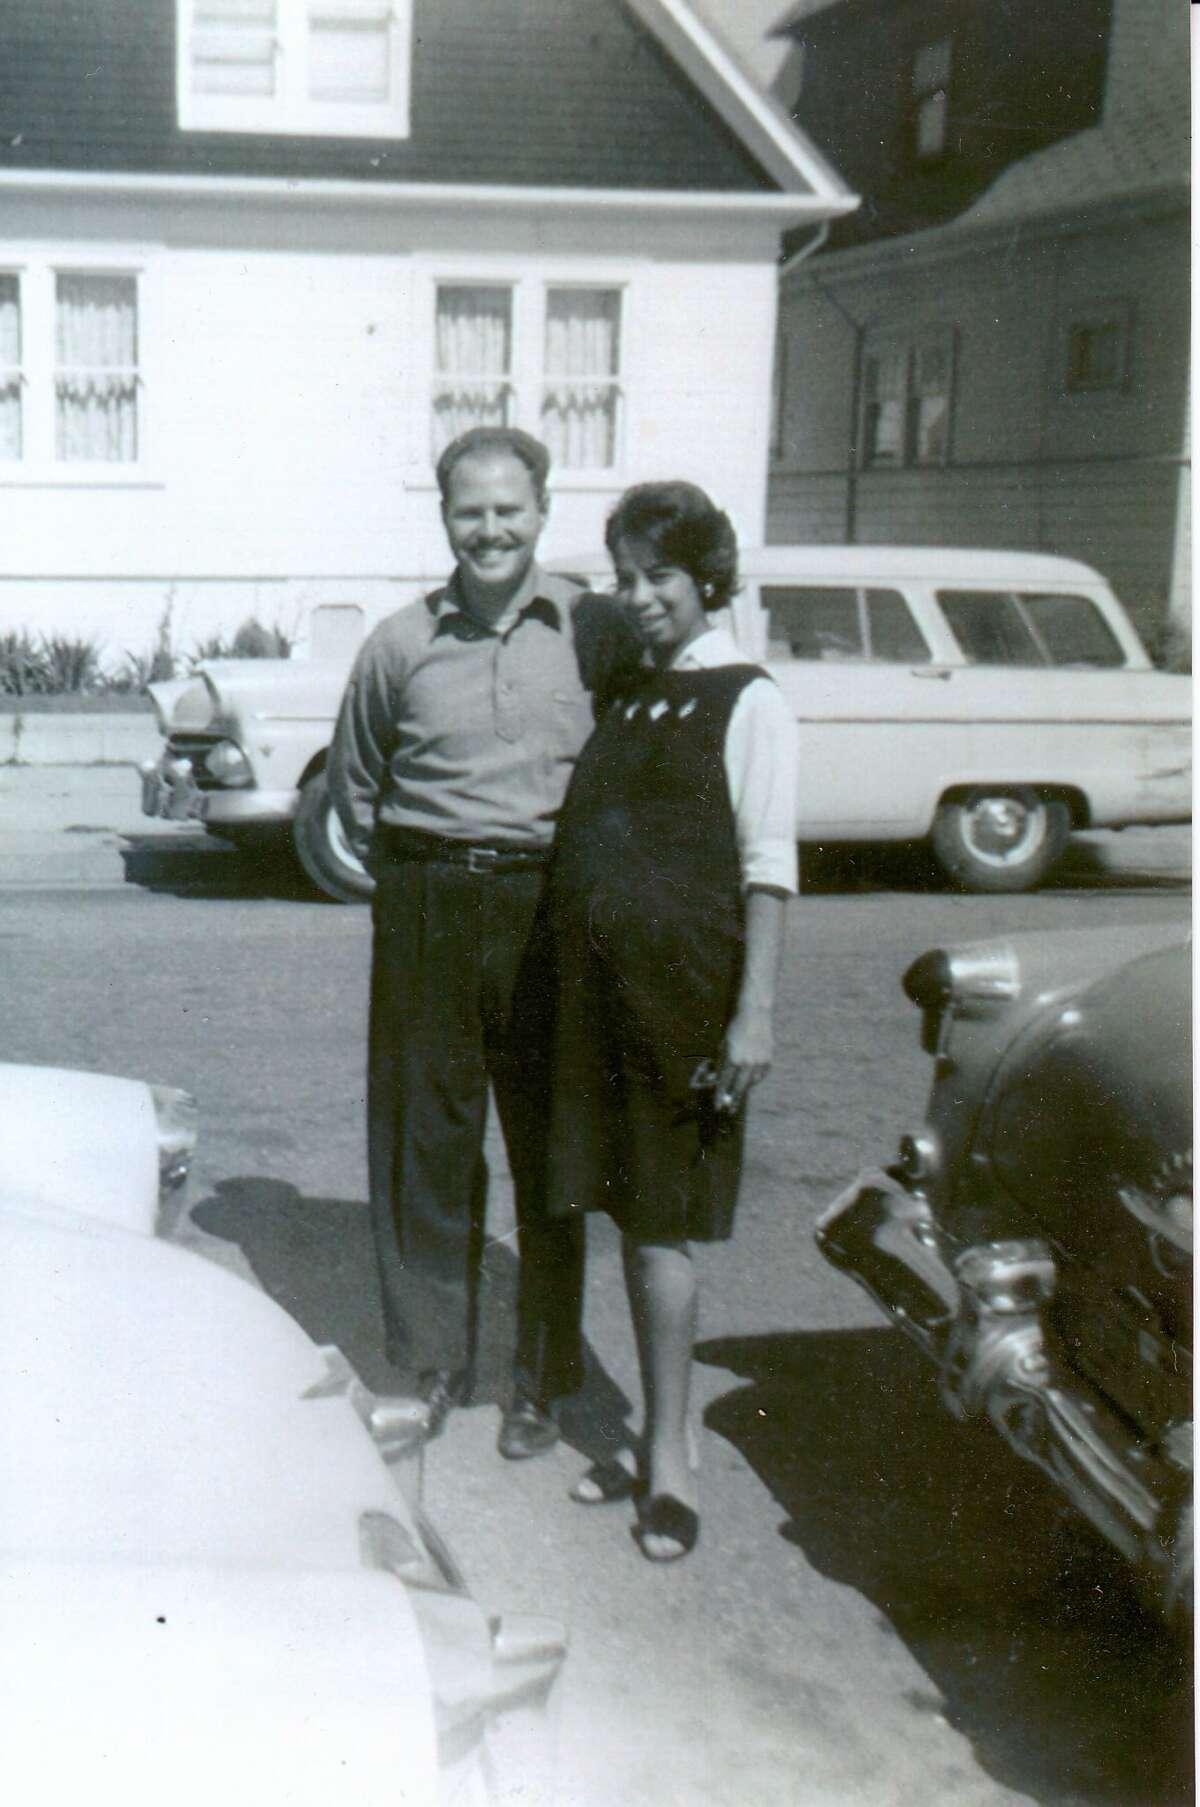 Photos of the Reinhertz family